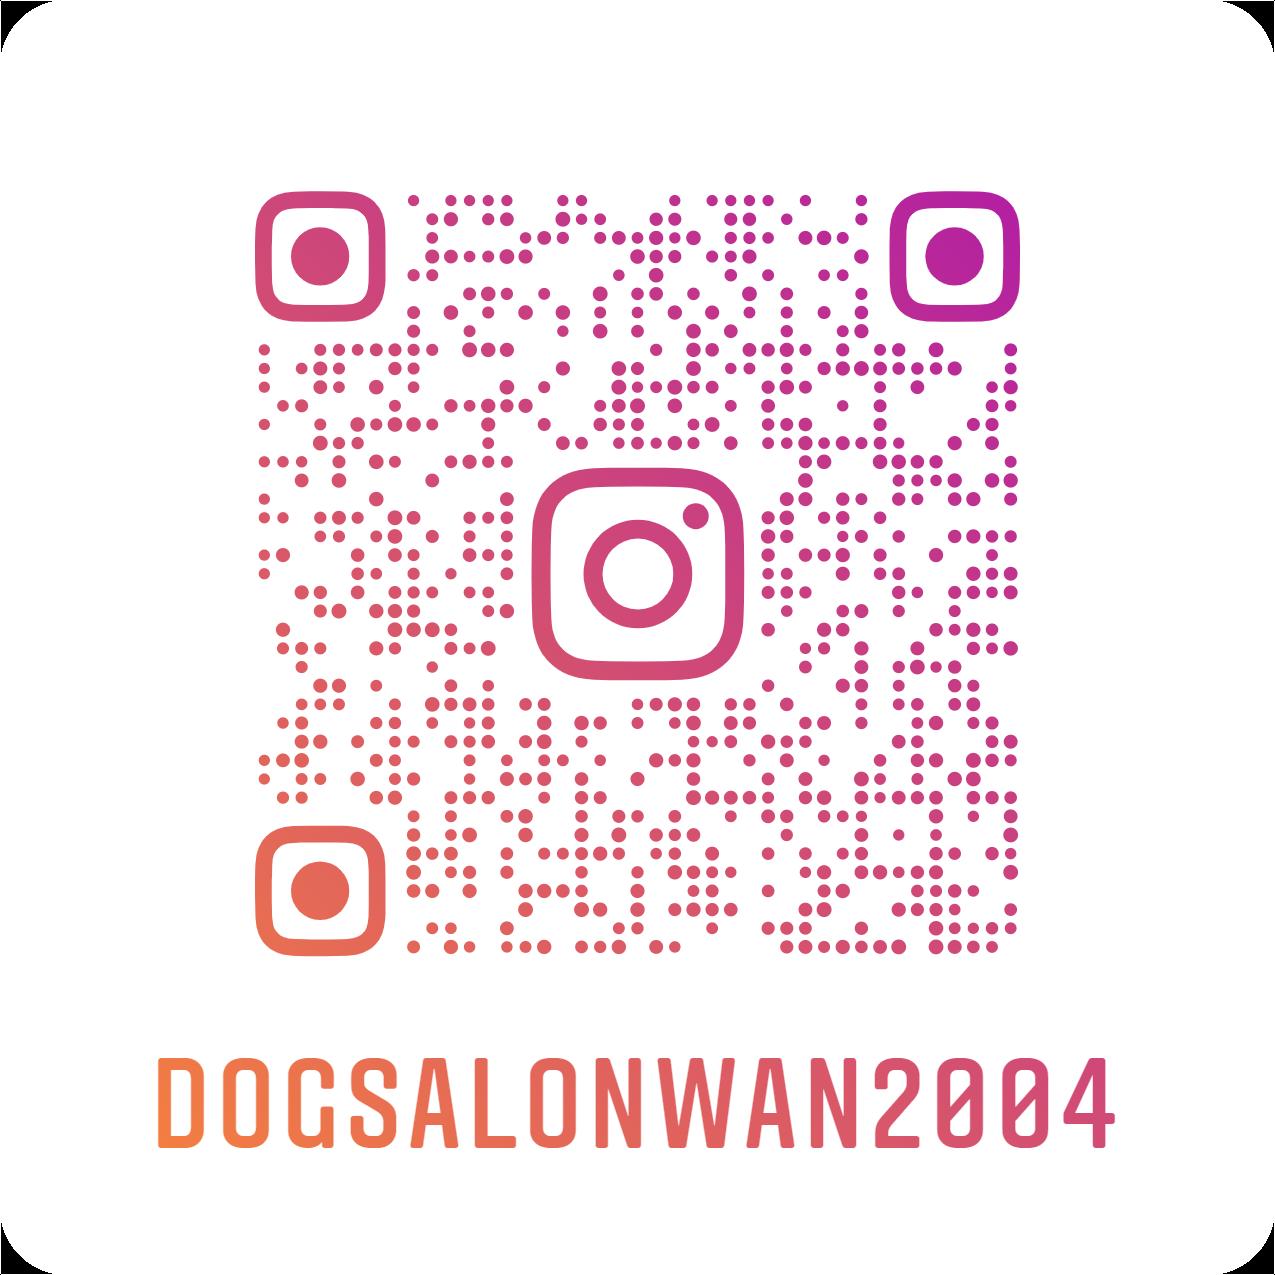 dogsalonwan2004_nametag_2021082913253586e_20211003091108a99.png